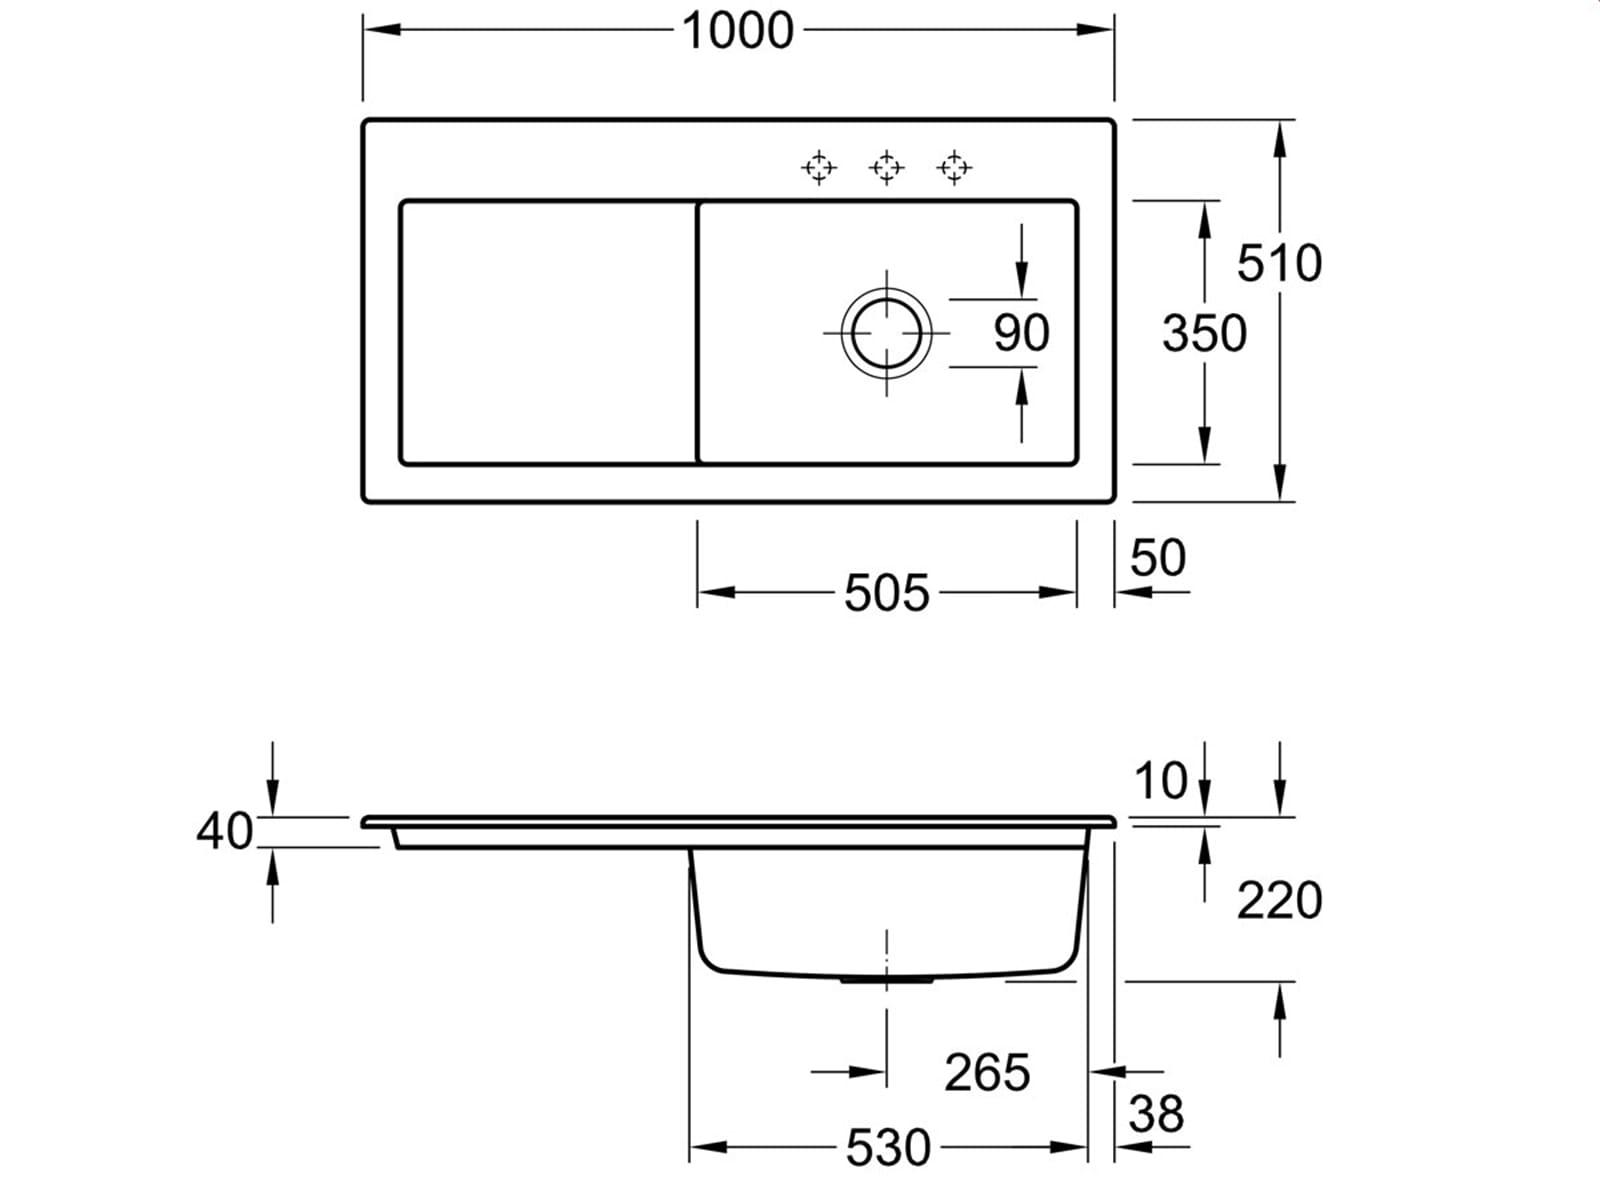 Villeroy & Boch Subway 60 XL Edelweiss - 6719 02 S3 Keramikspüle Exzenterbetätigung